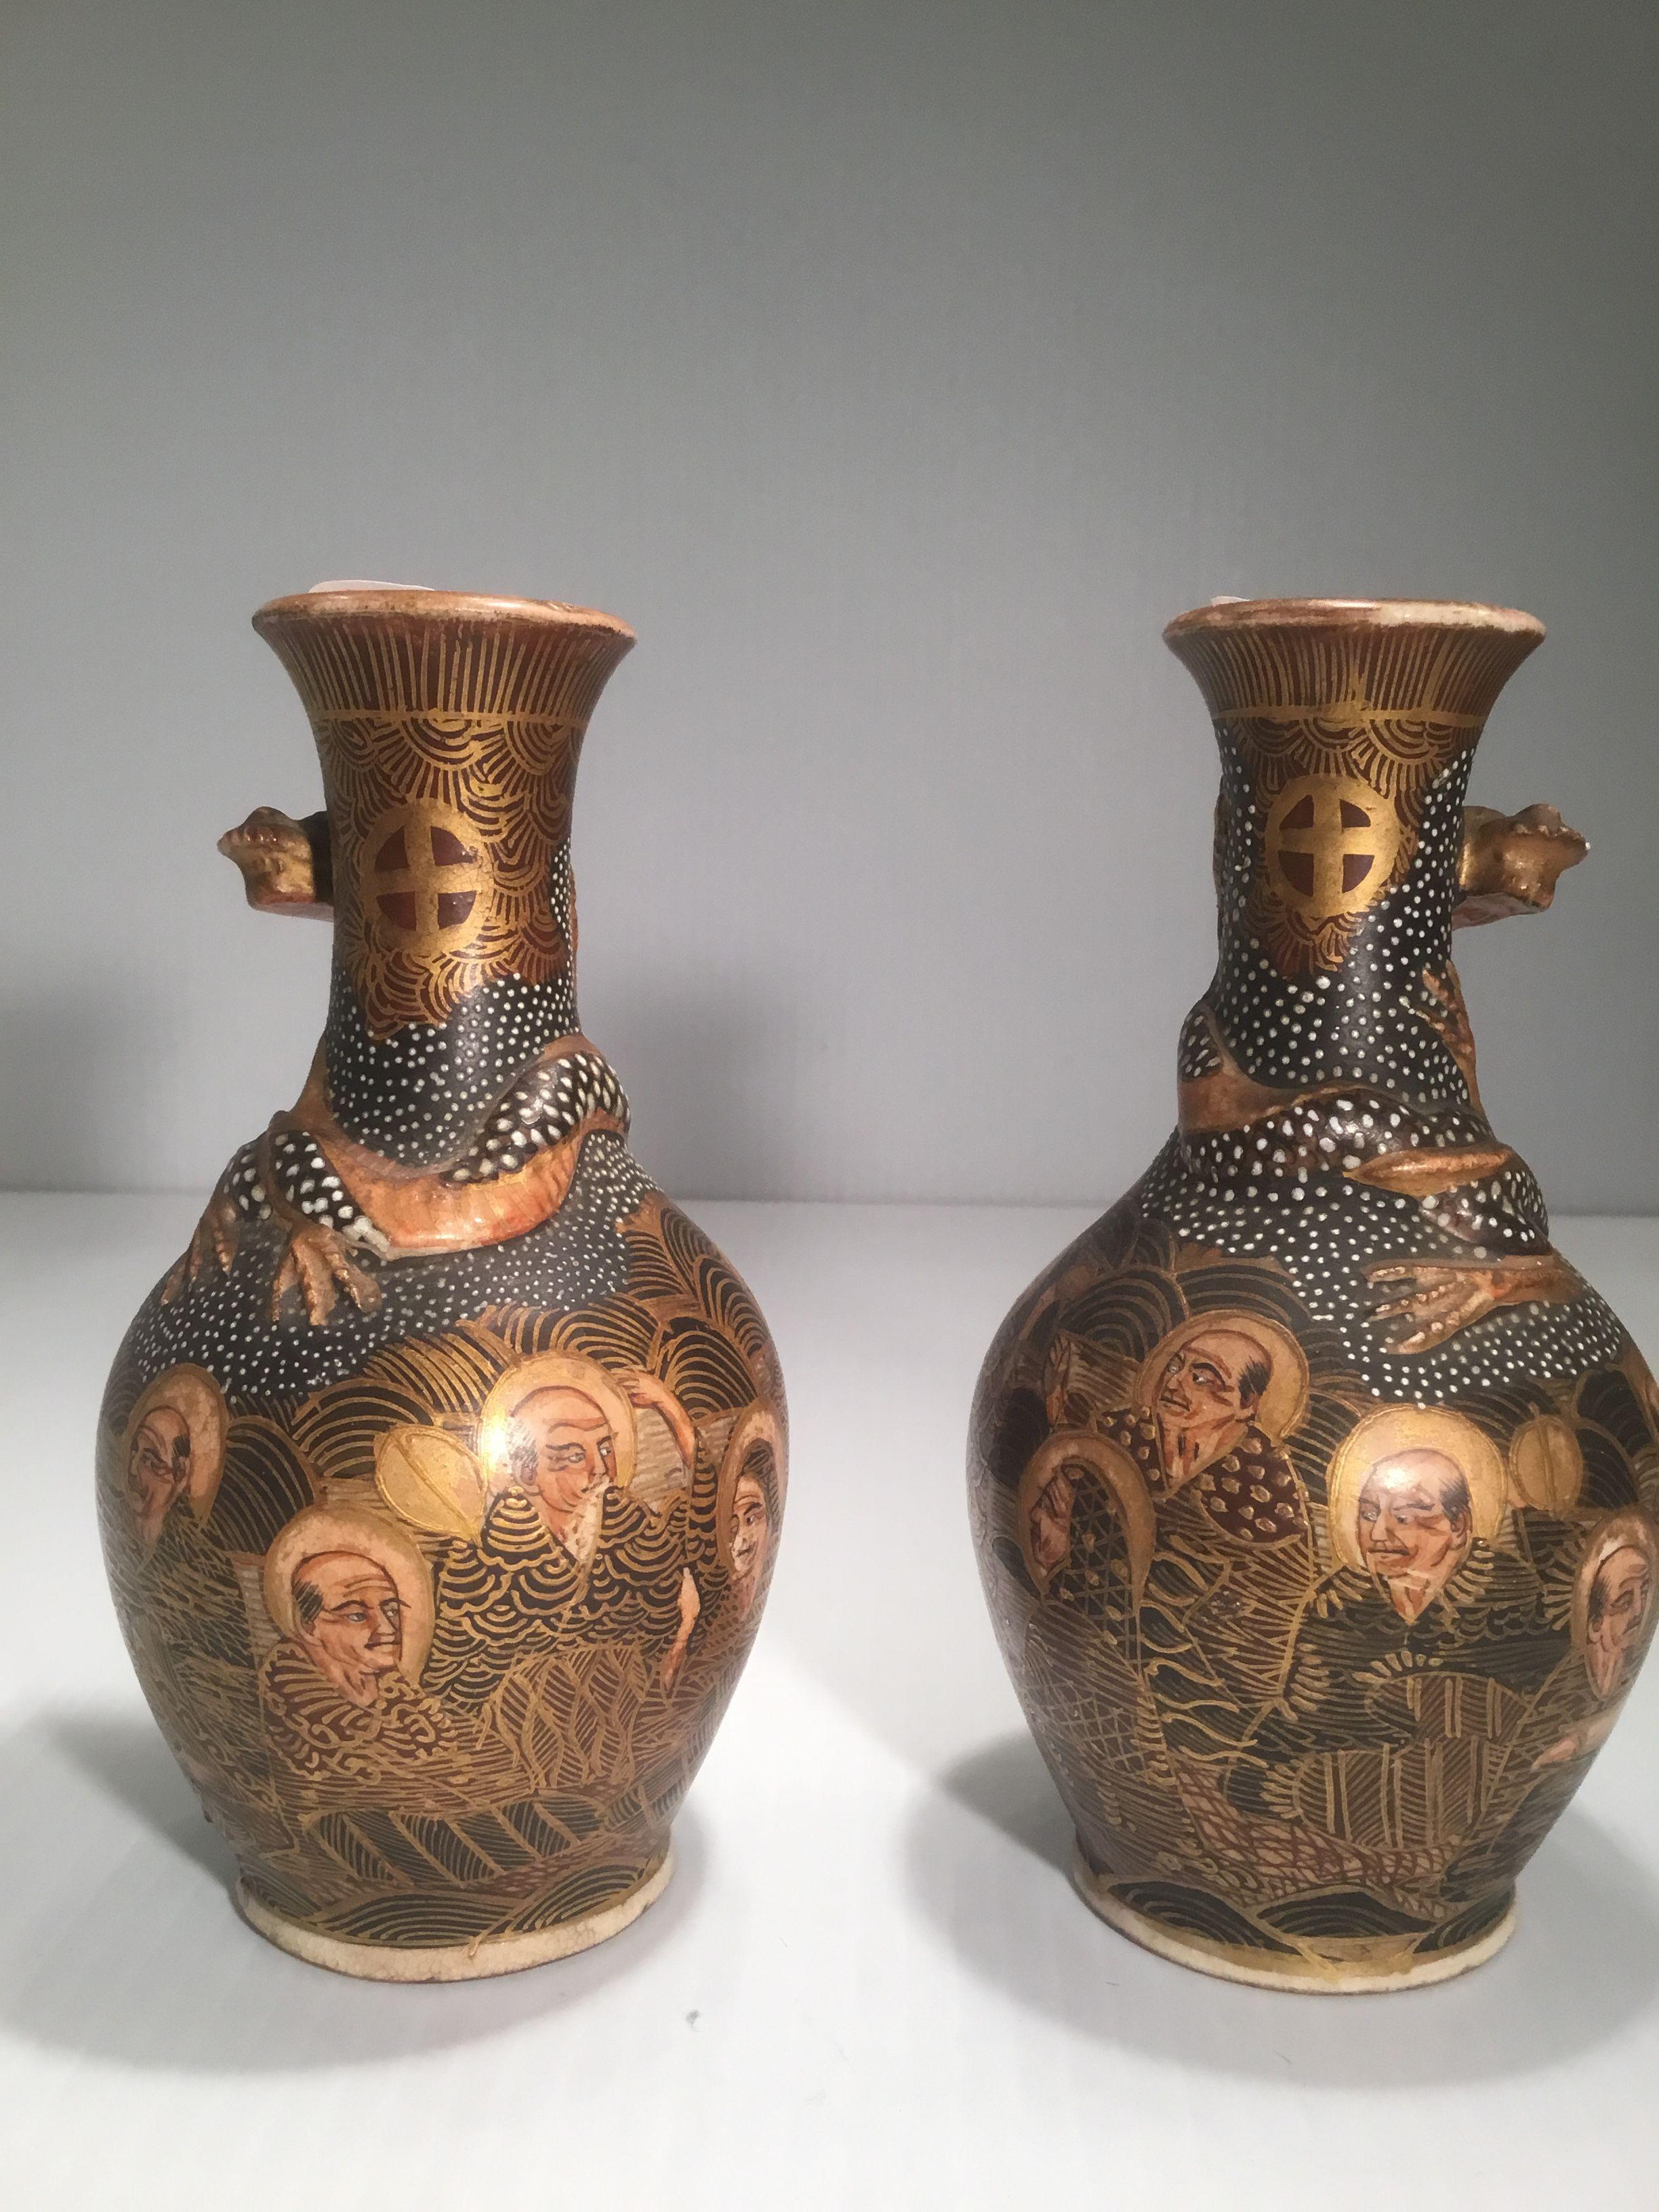 satsuma vase value of hododa satsuma vases pinterest ware f c pertaining to hododa